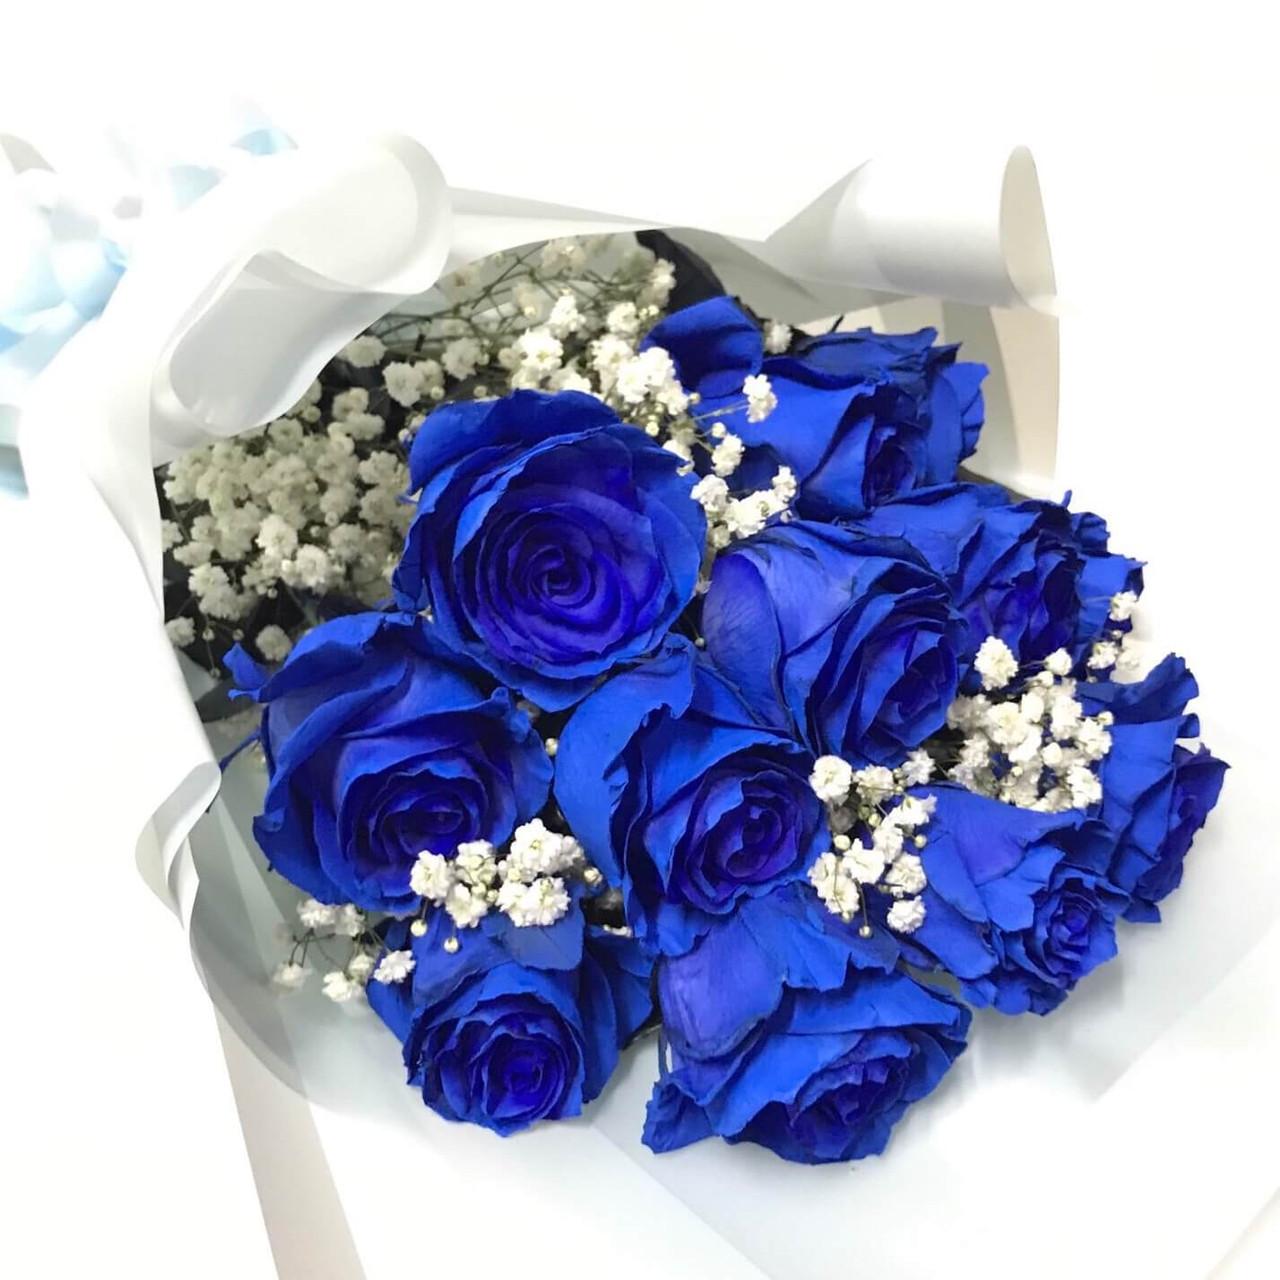 12 Blue Ecuadorian Roses